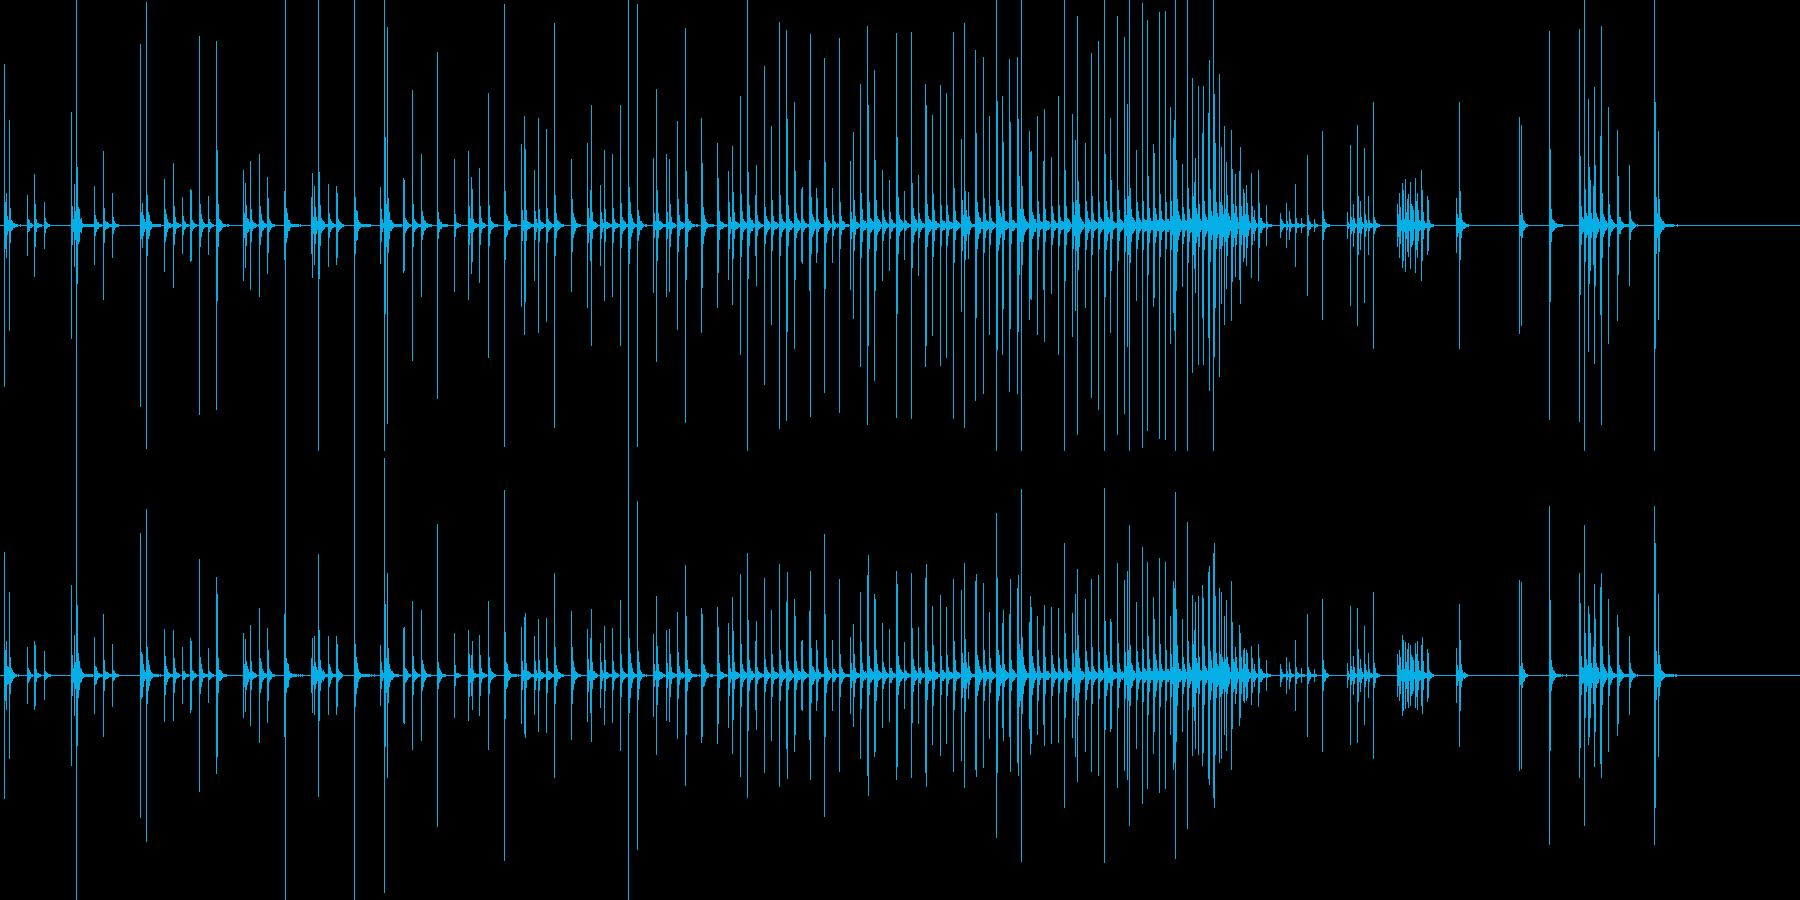 小木魚木章11歌舞伎黒御簾下座音楽和風日の再生済みの波形